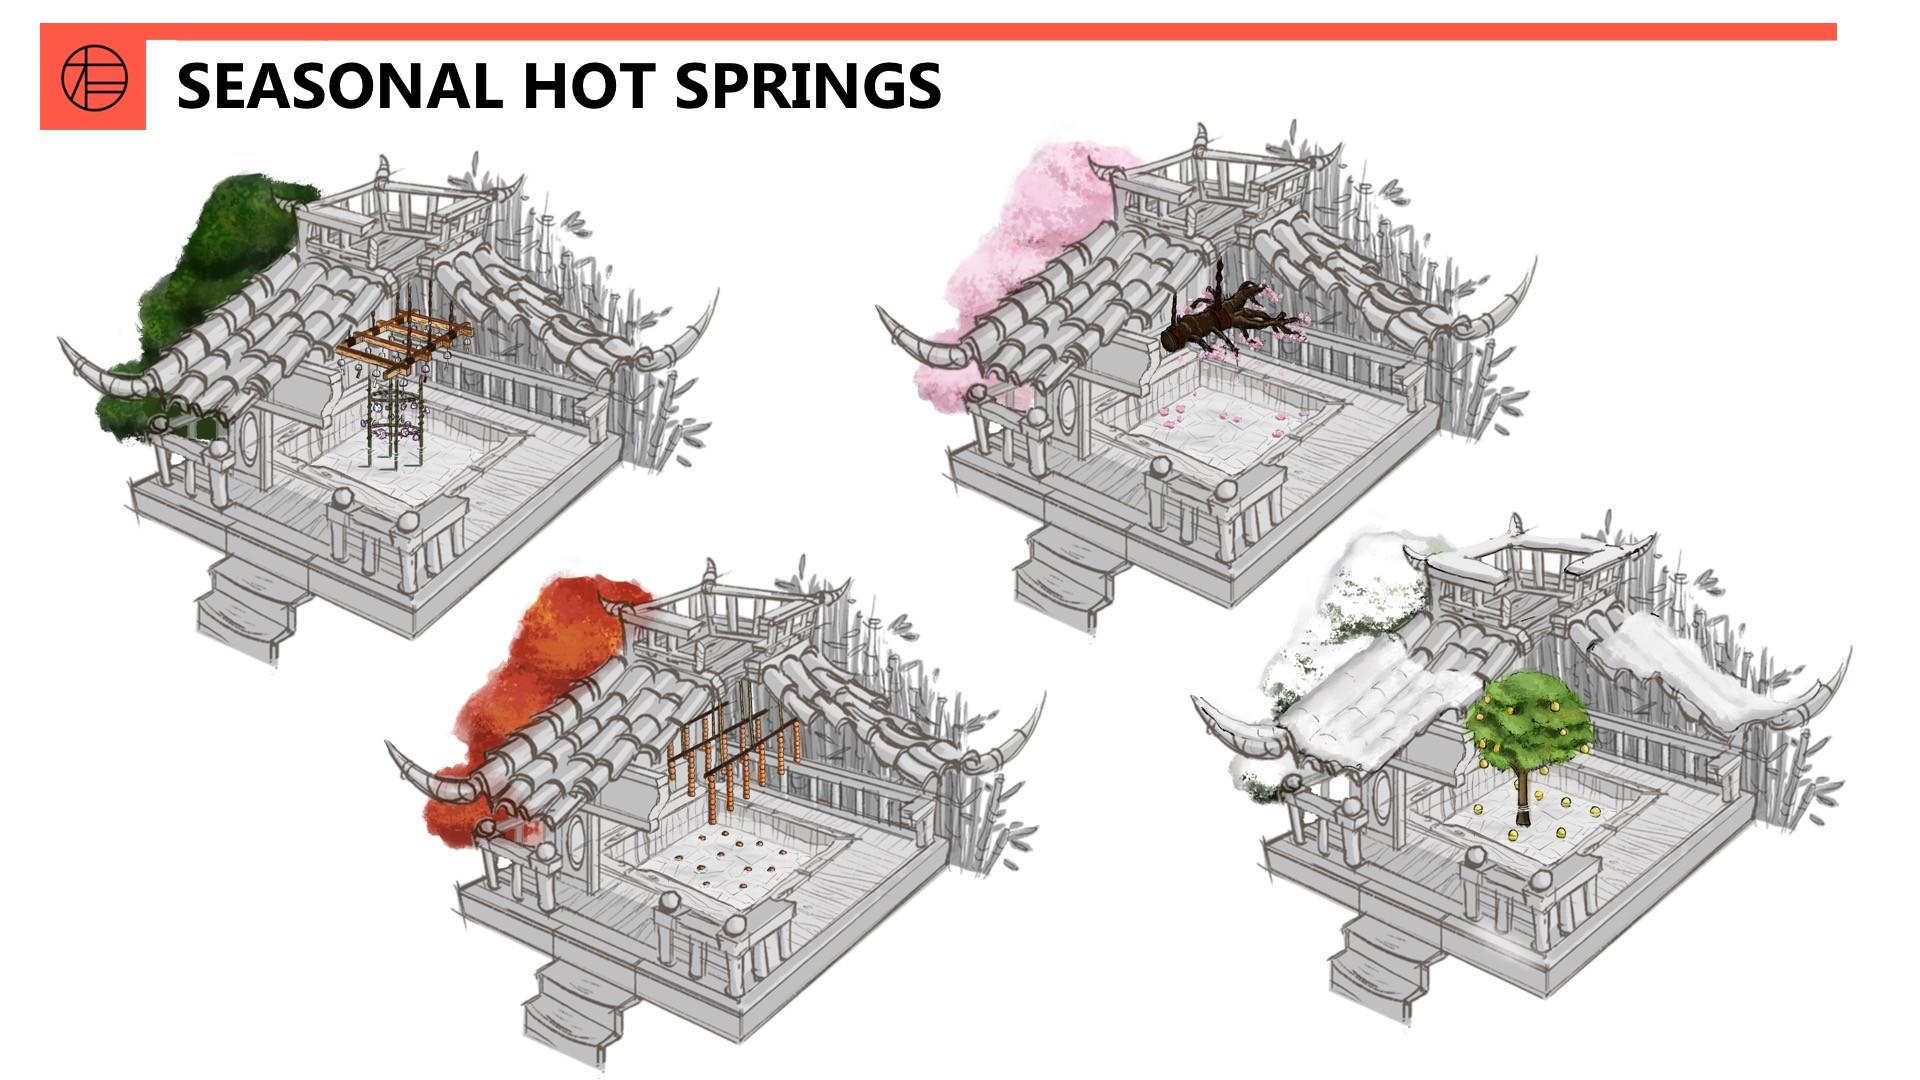 Seasonal Hot Springs